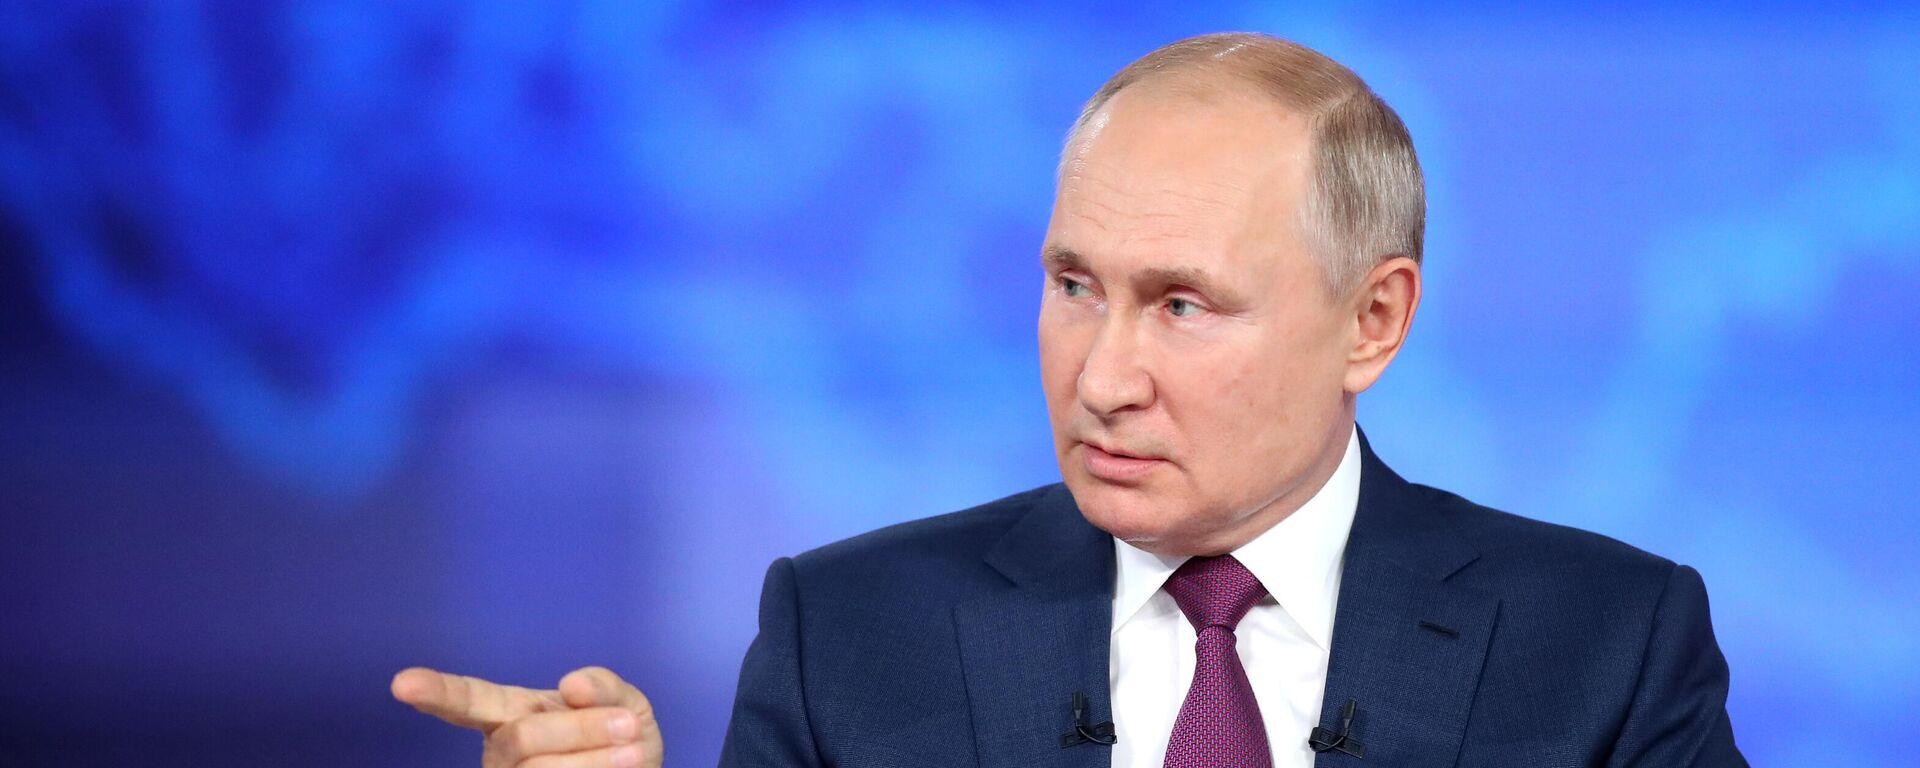 Президент РФ Владимир Путин - Sputnik Тоҷикистон, 1920, 14.09.2021